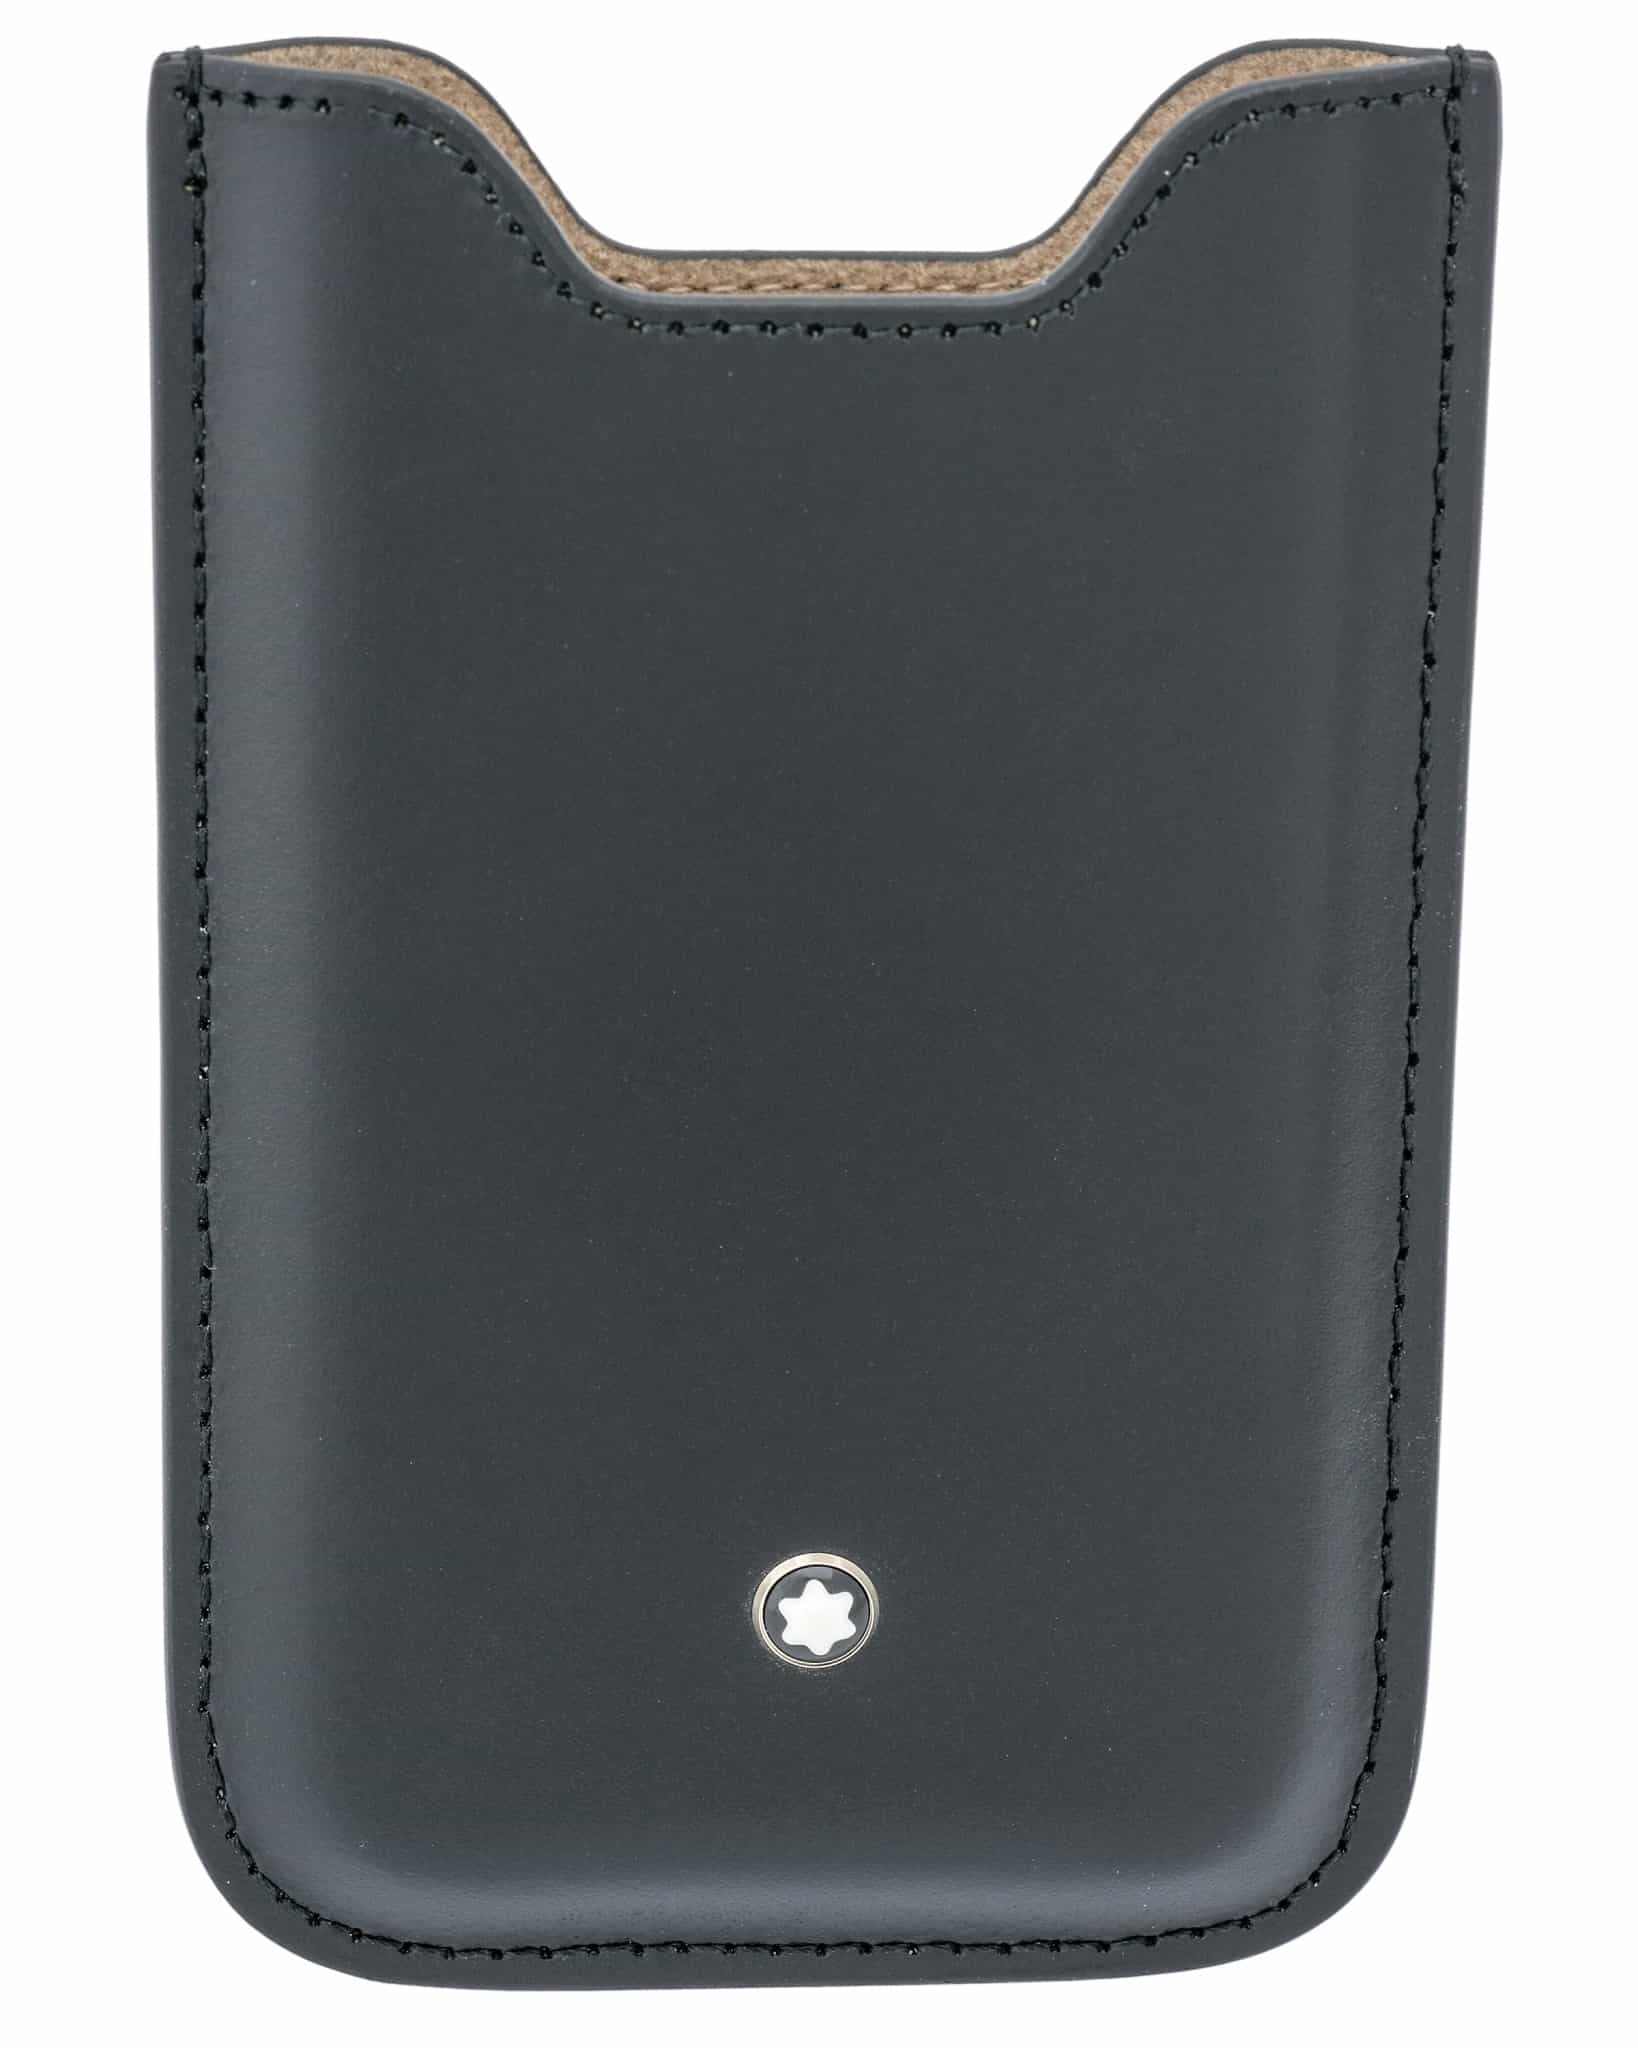 Montblanc Black Calf Leather Iphone SE Case 108009